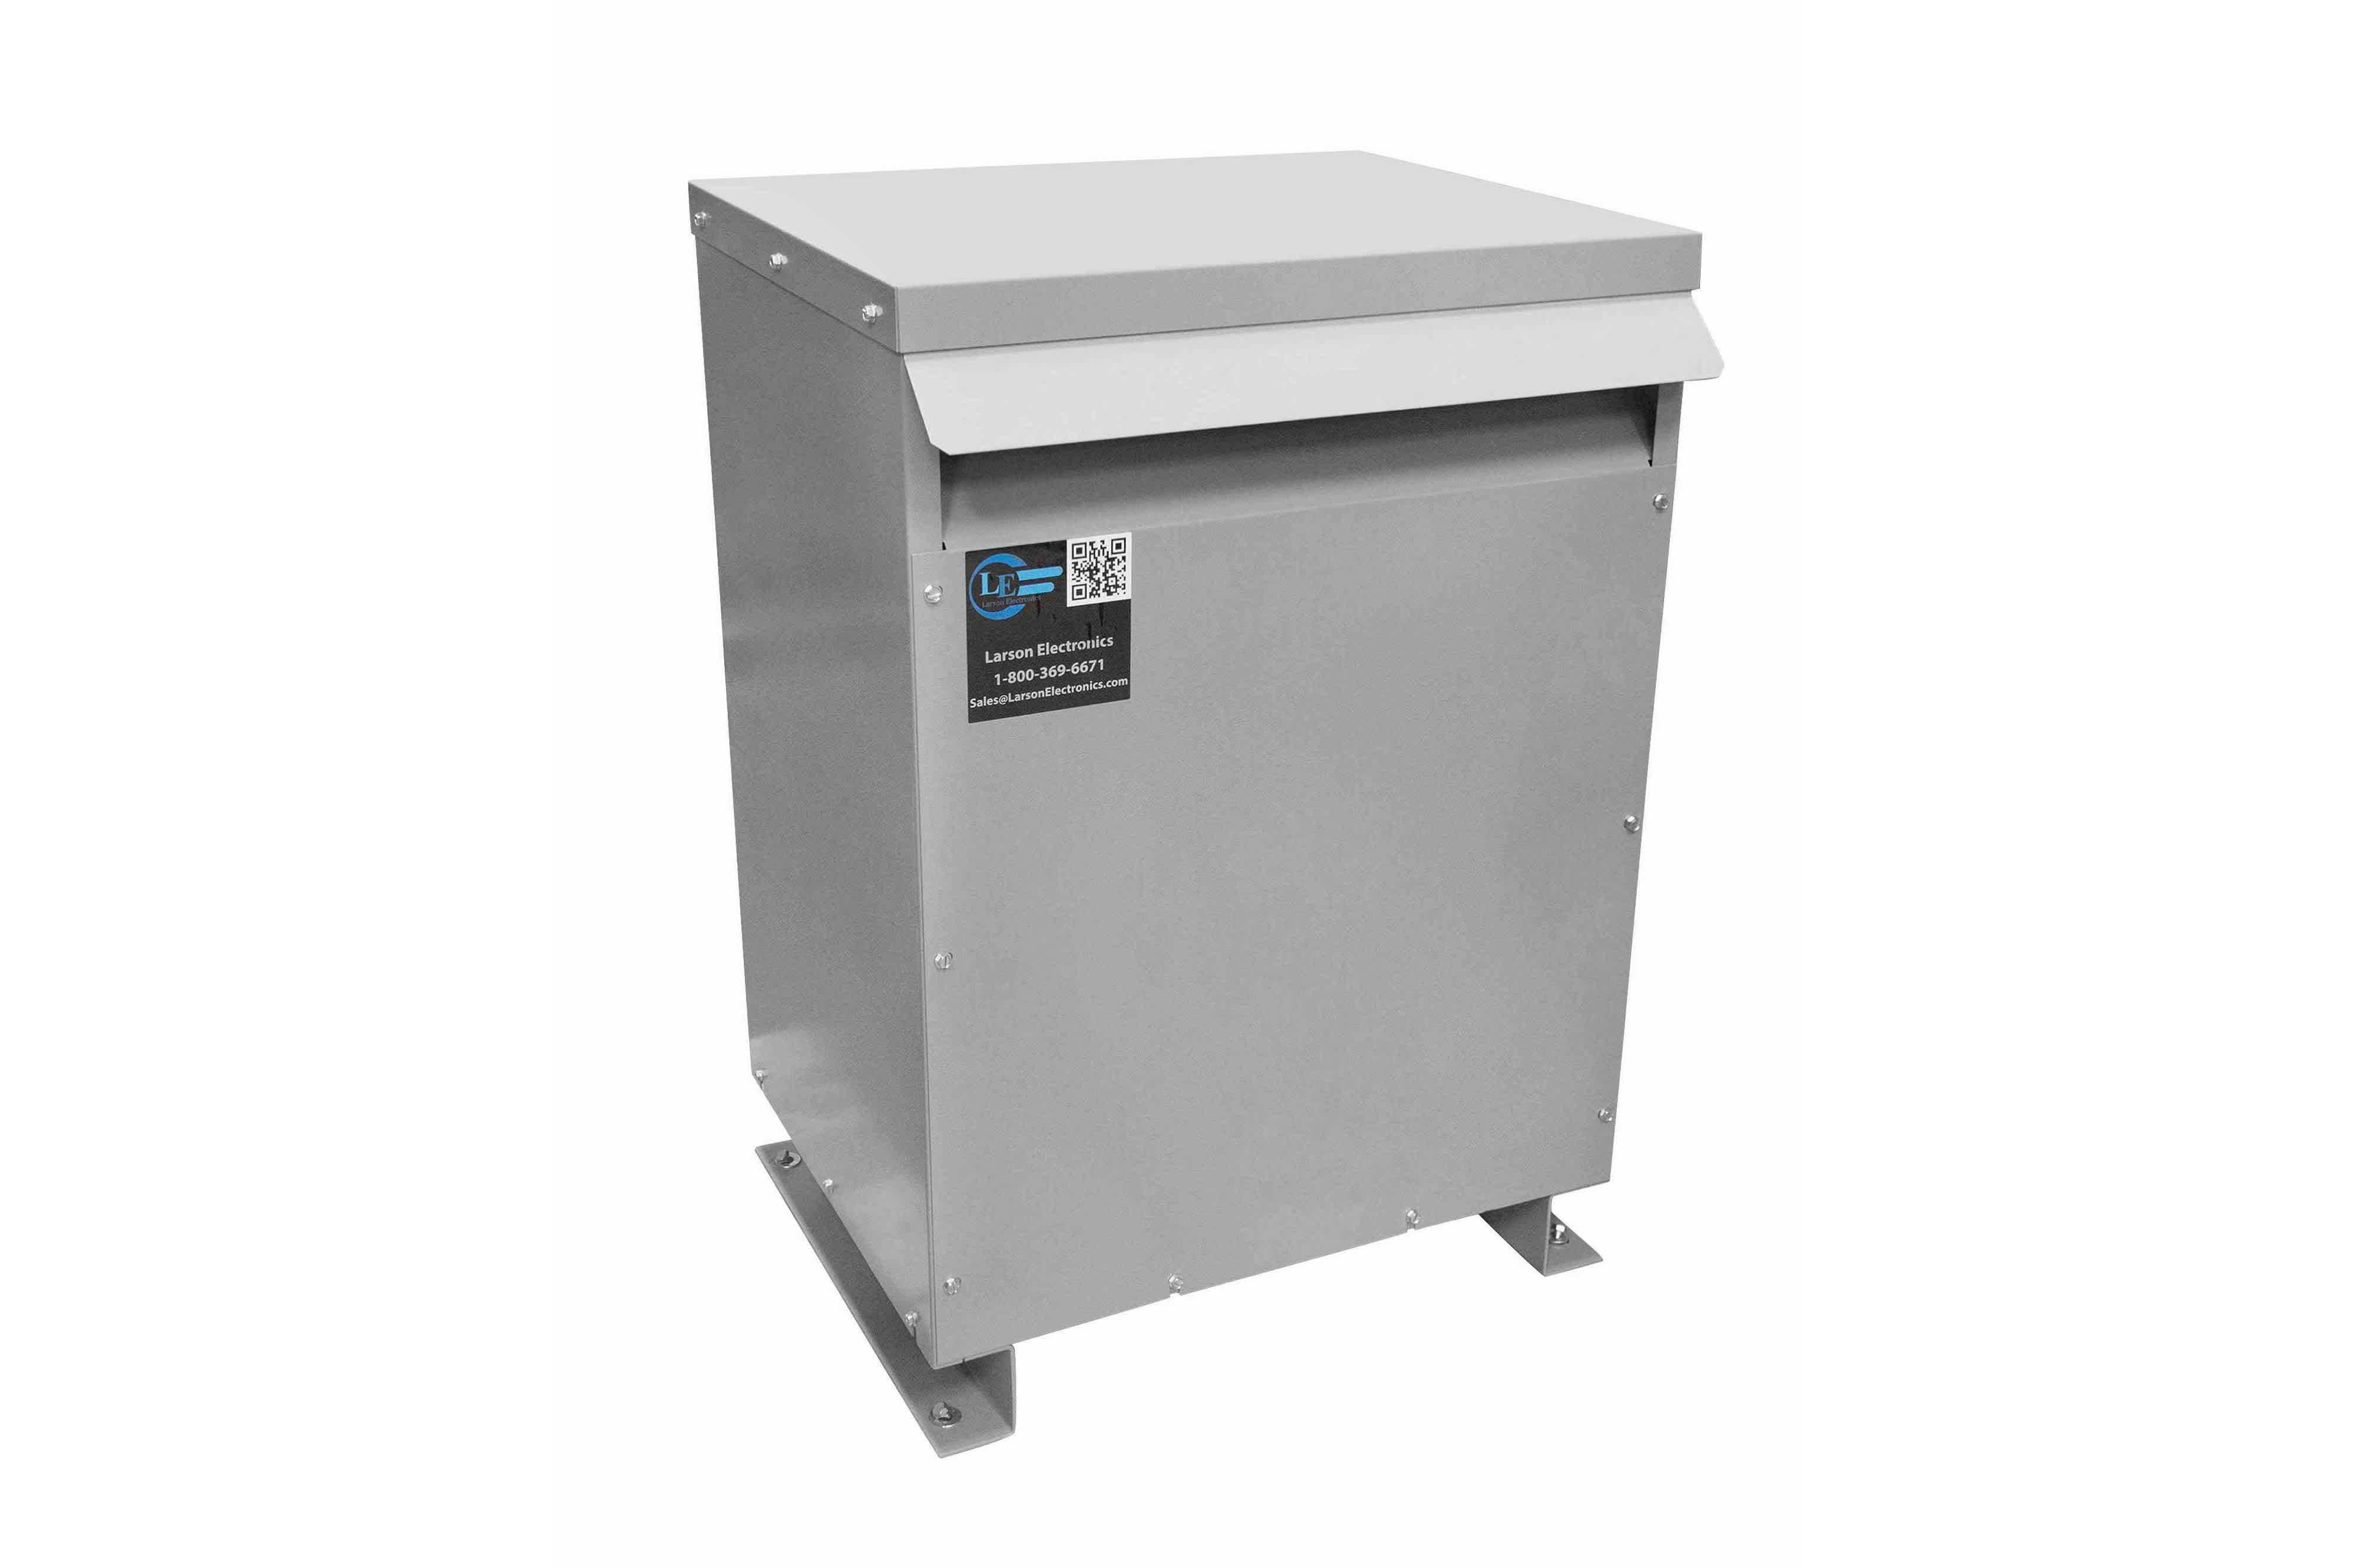 250 kVA 3PH Isolation Transformer, 480V Wye Primary, 575Y/332 Wye-N Secondary, N3R, Ventilated, 60 Hz